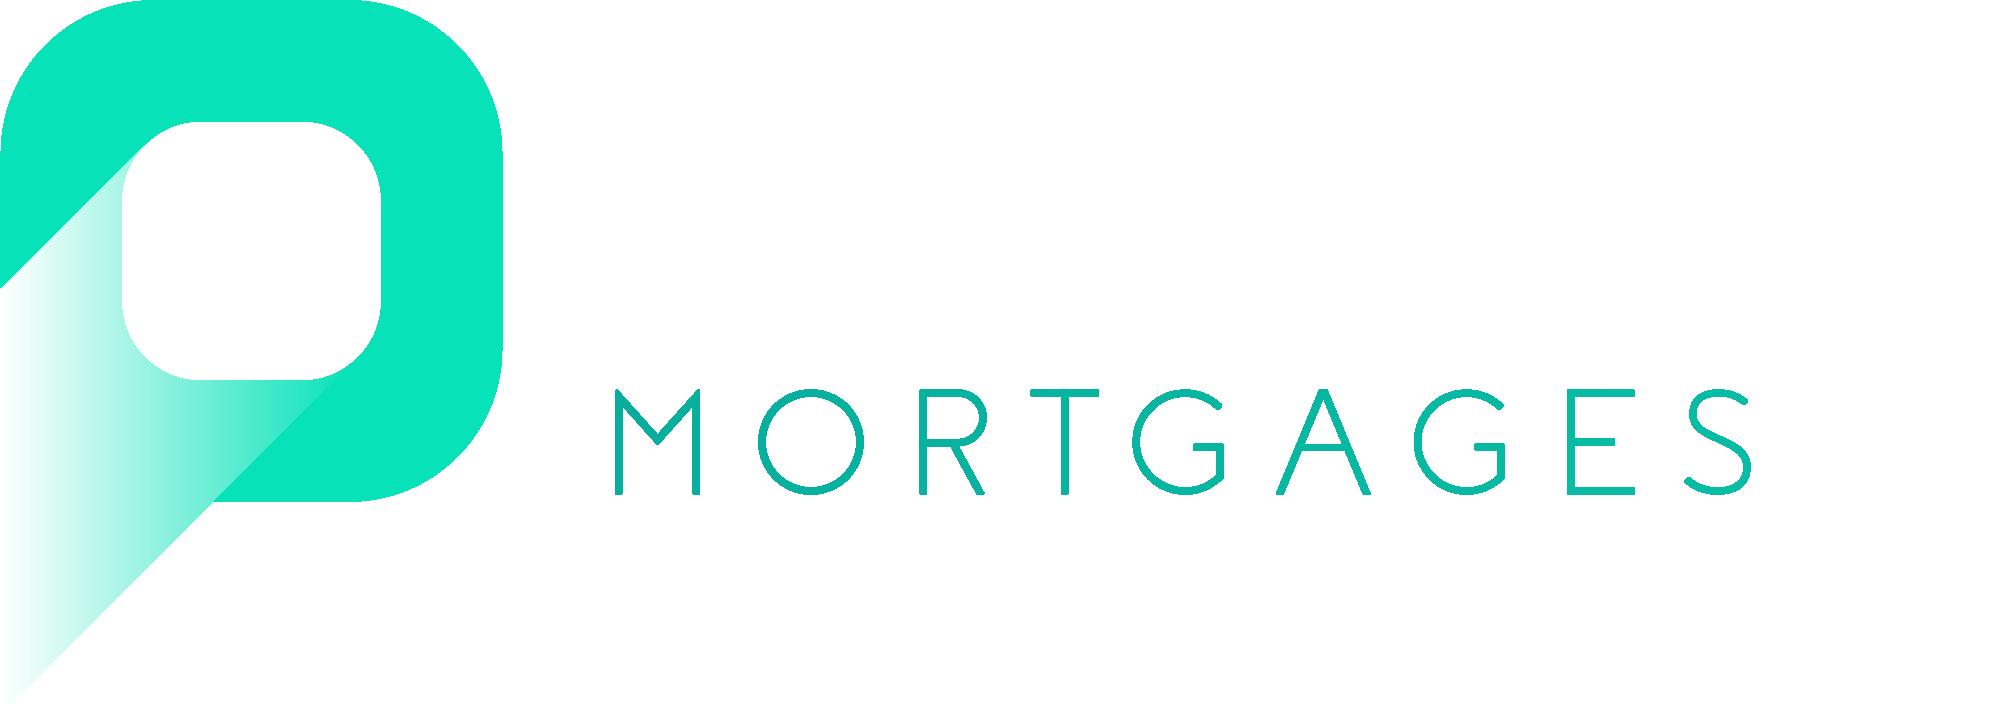 Principle Mortgages